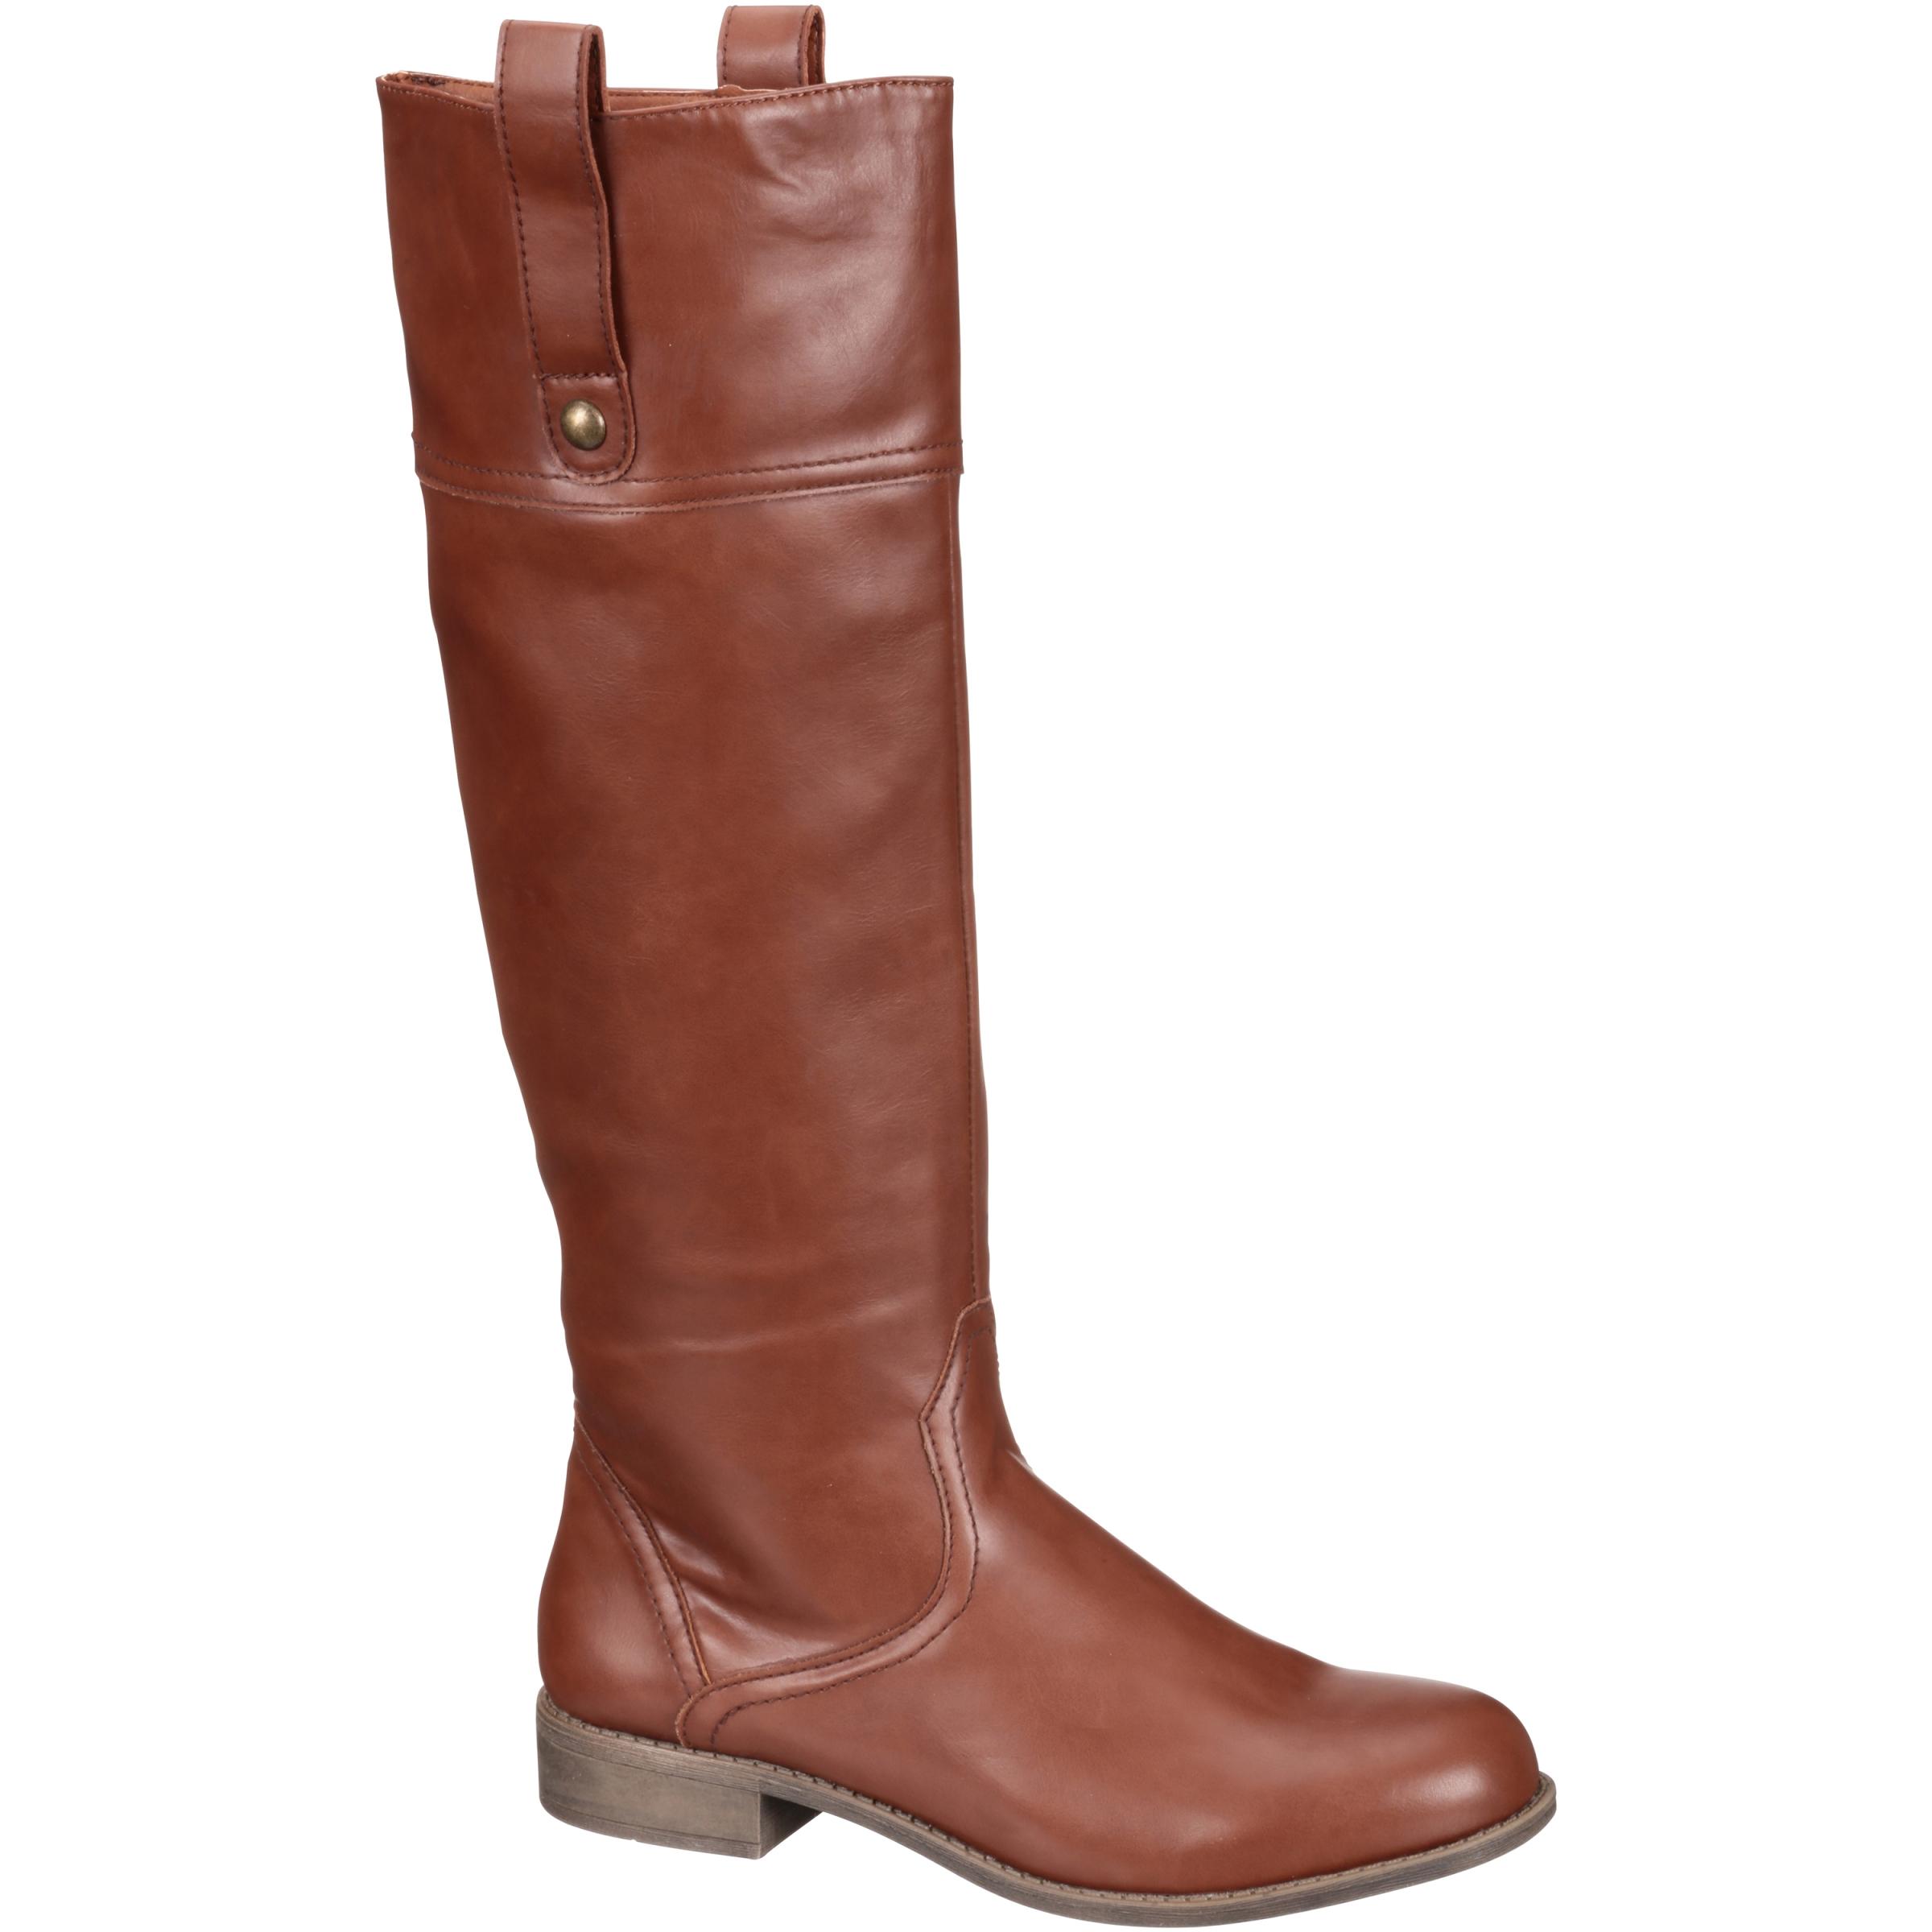 MoMo Women's Alani Boot Shoe Size: 8